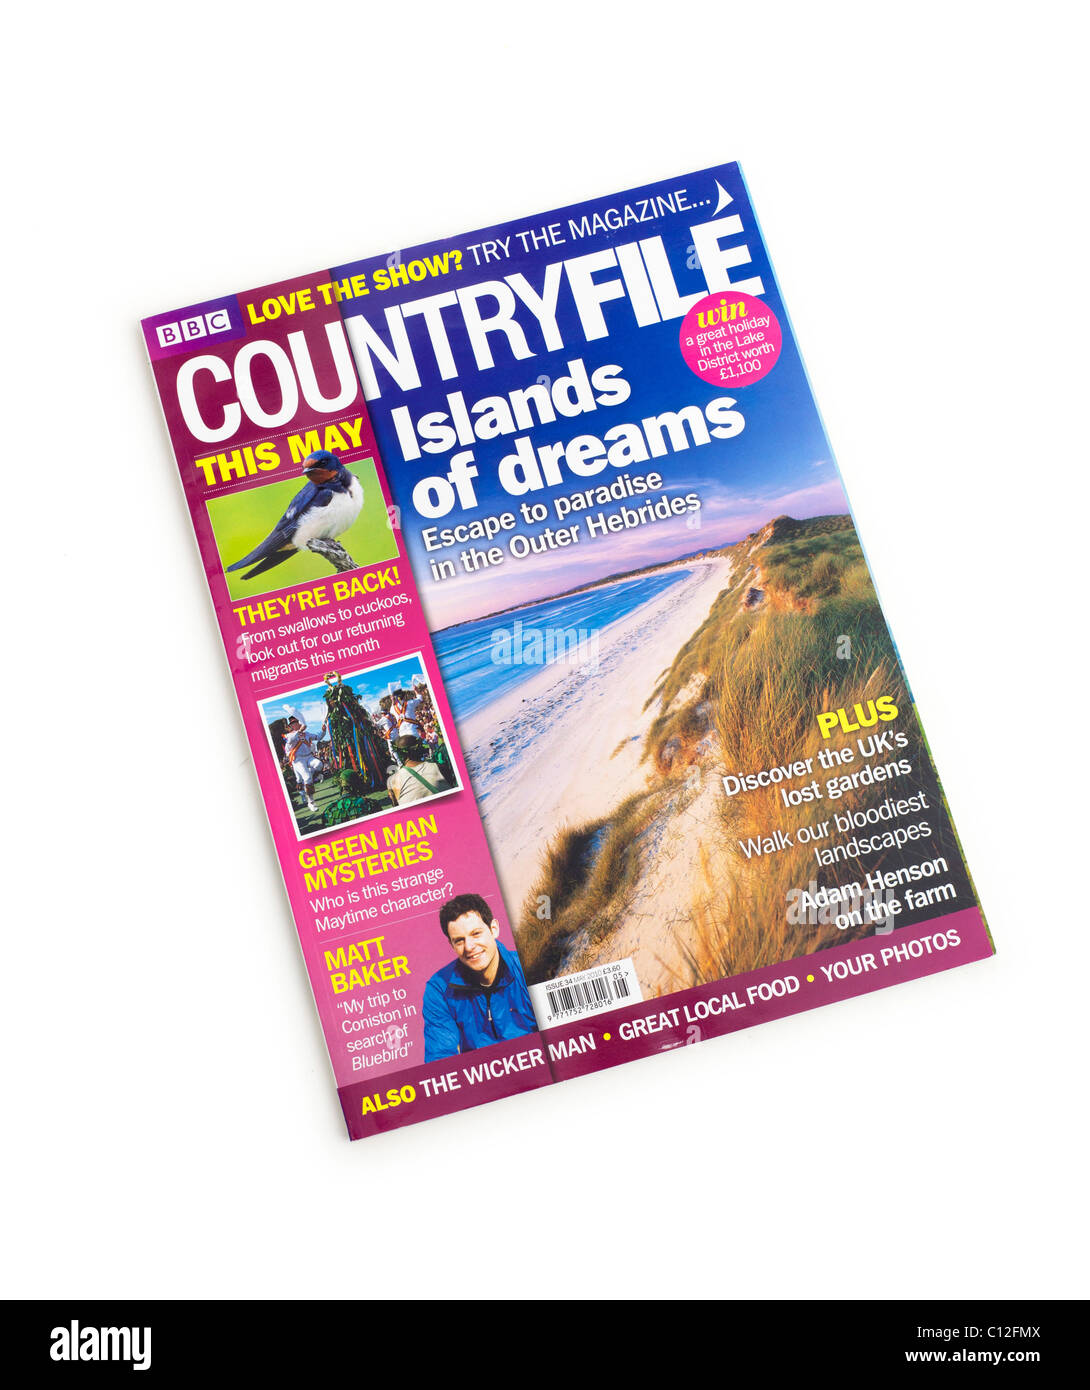 CountryFile magazine - Stock Image